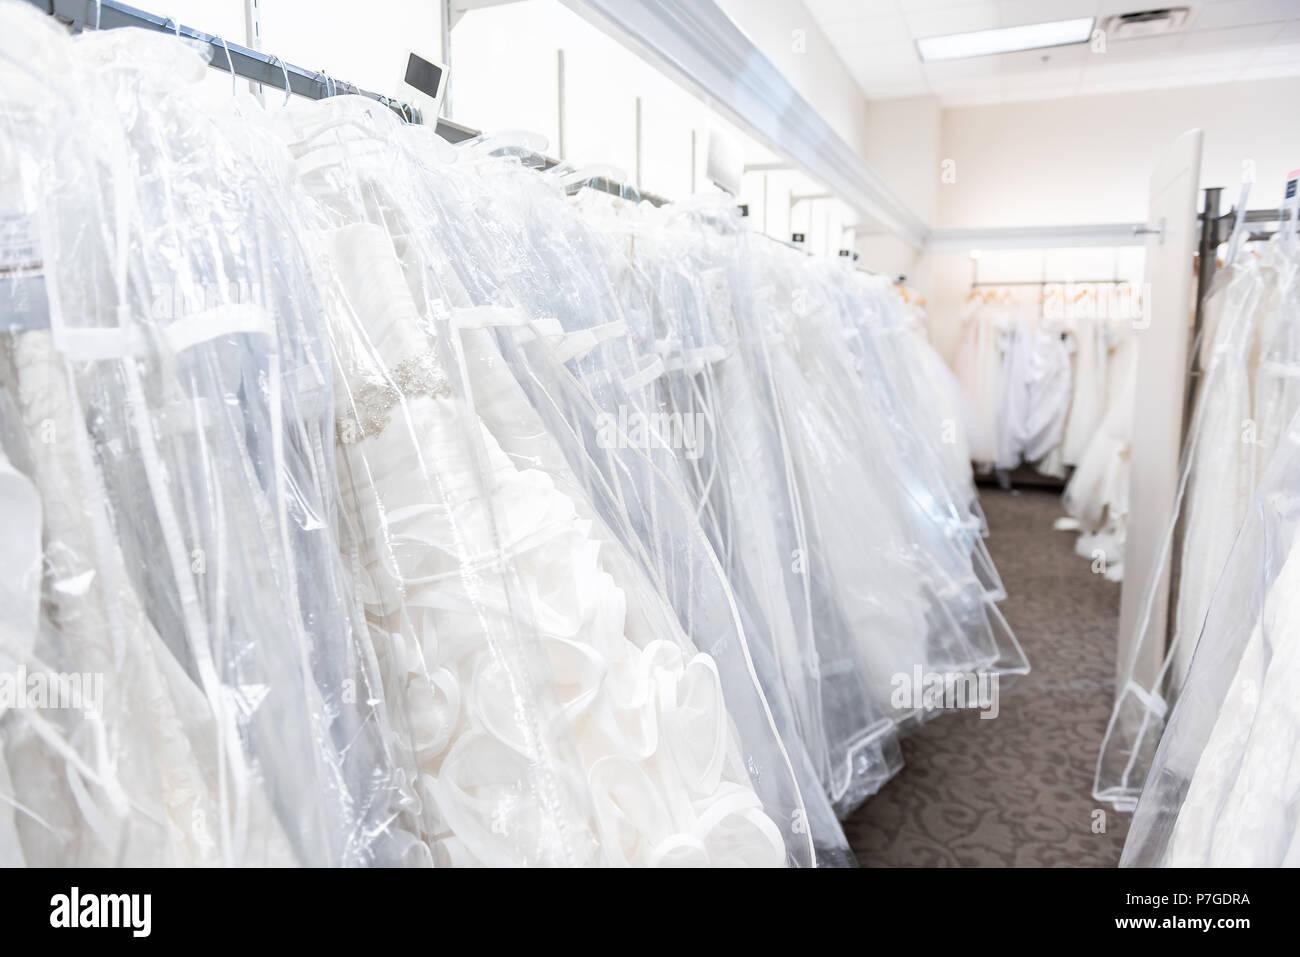 Fotos de vestidos de novia colgados